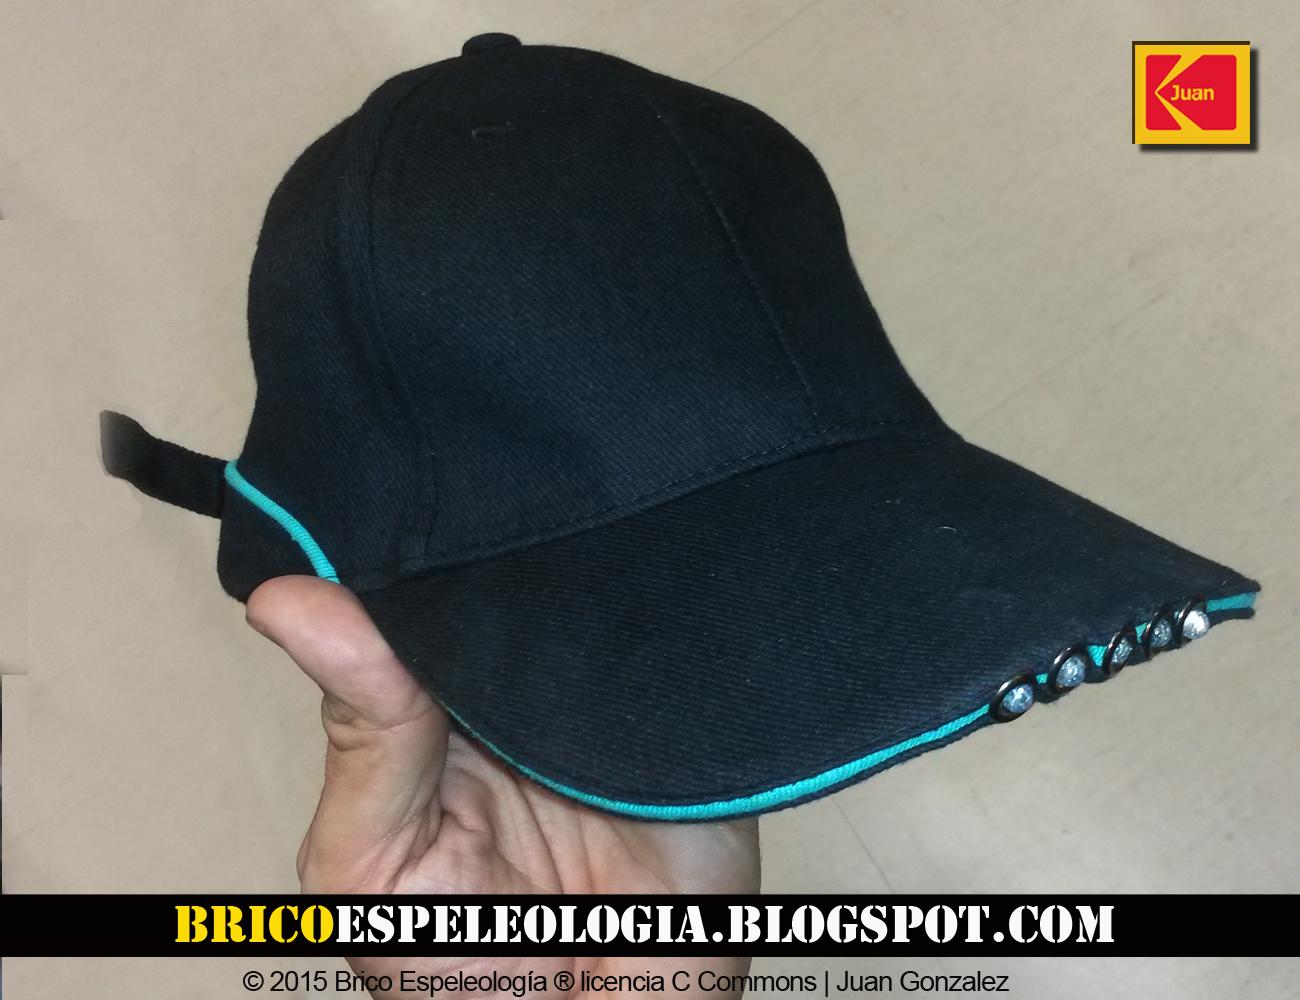 Brico Espeleologia  Light-cap de Wolfcraft  La gorra con luz cf29cc35b31